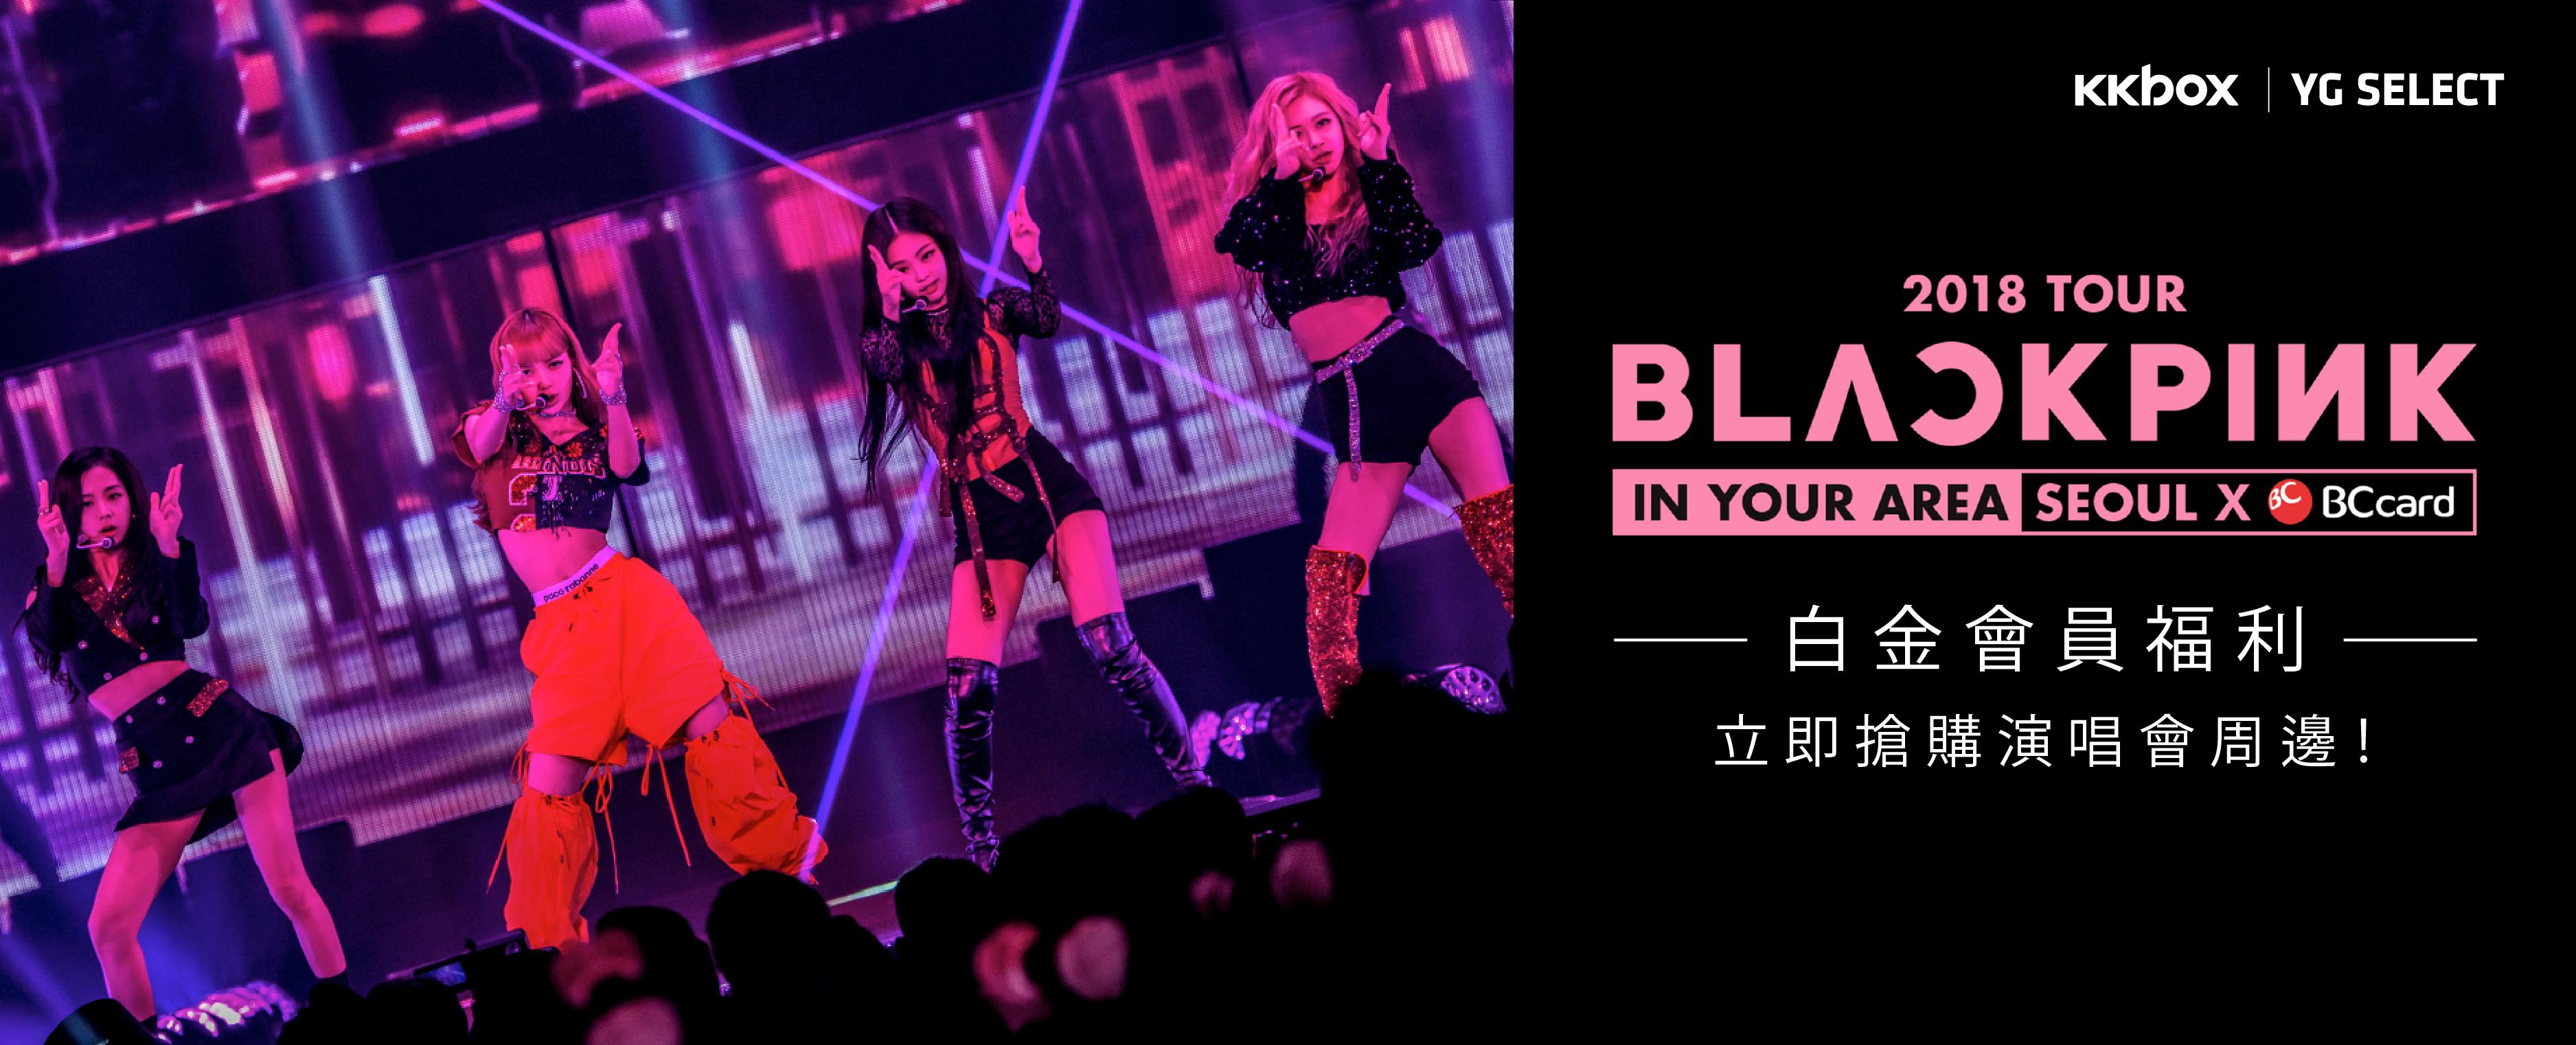 BLACKPINK/演唱會周邊 KK選物